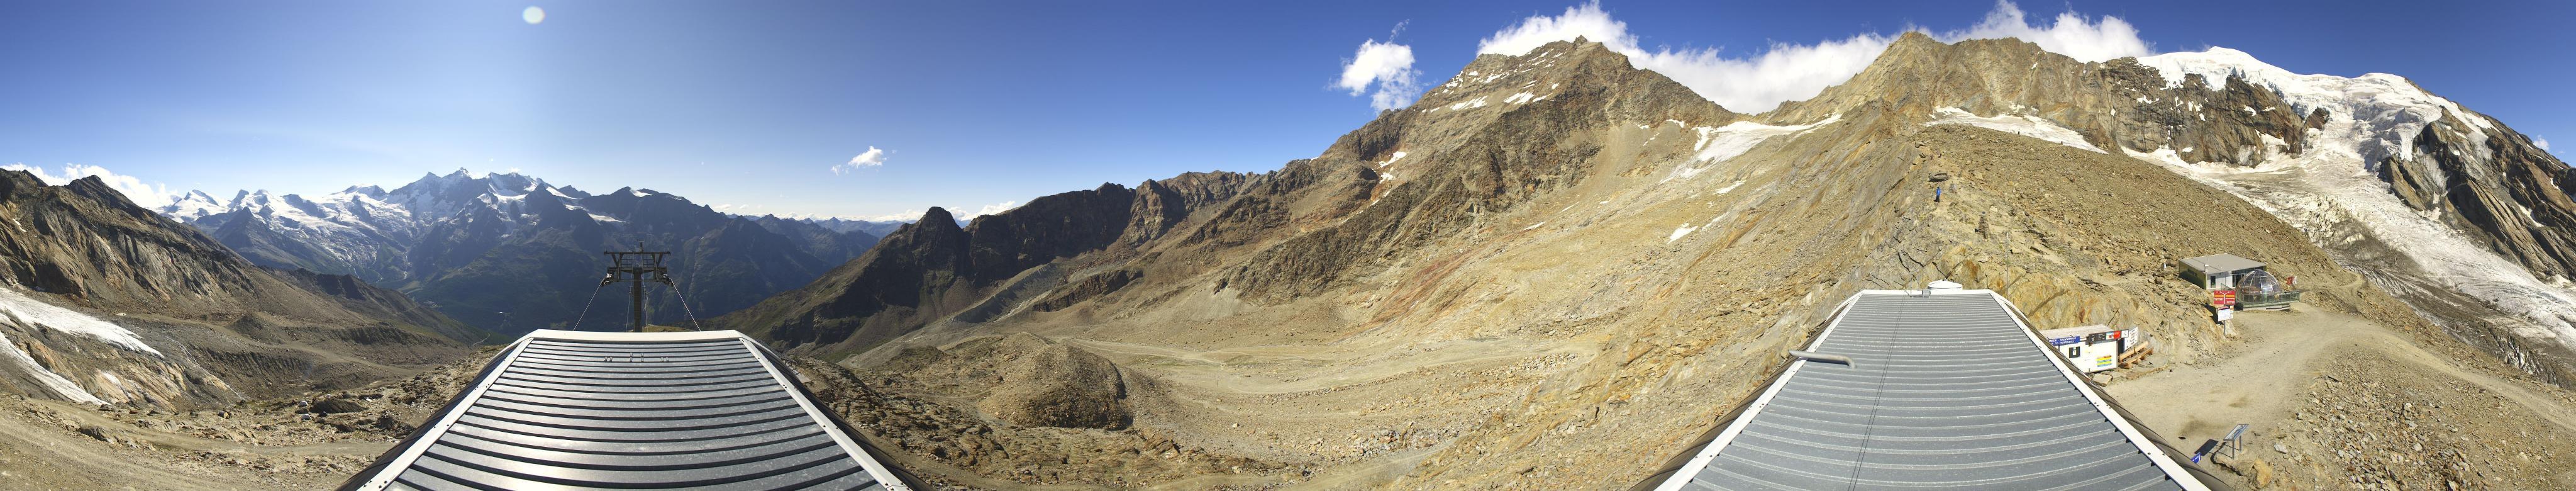 Saas-Grund: Bergbahnen Hohsaas